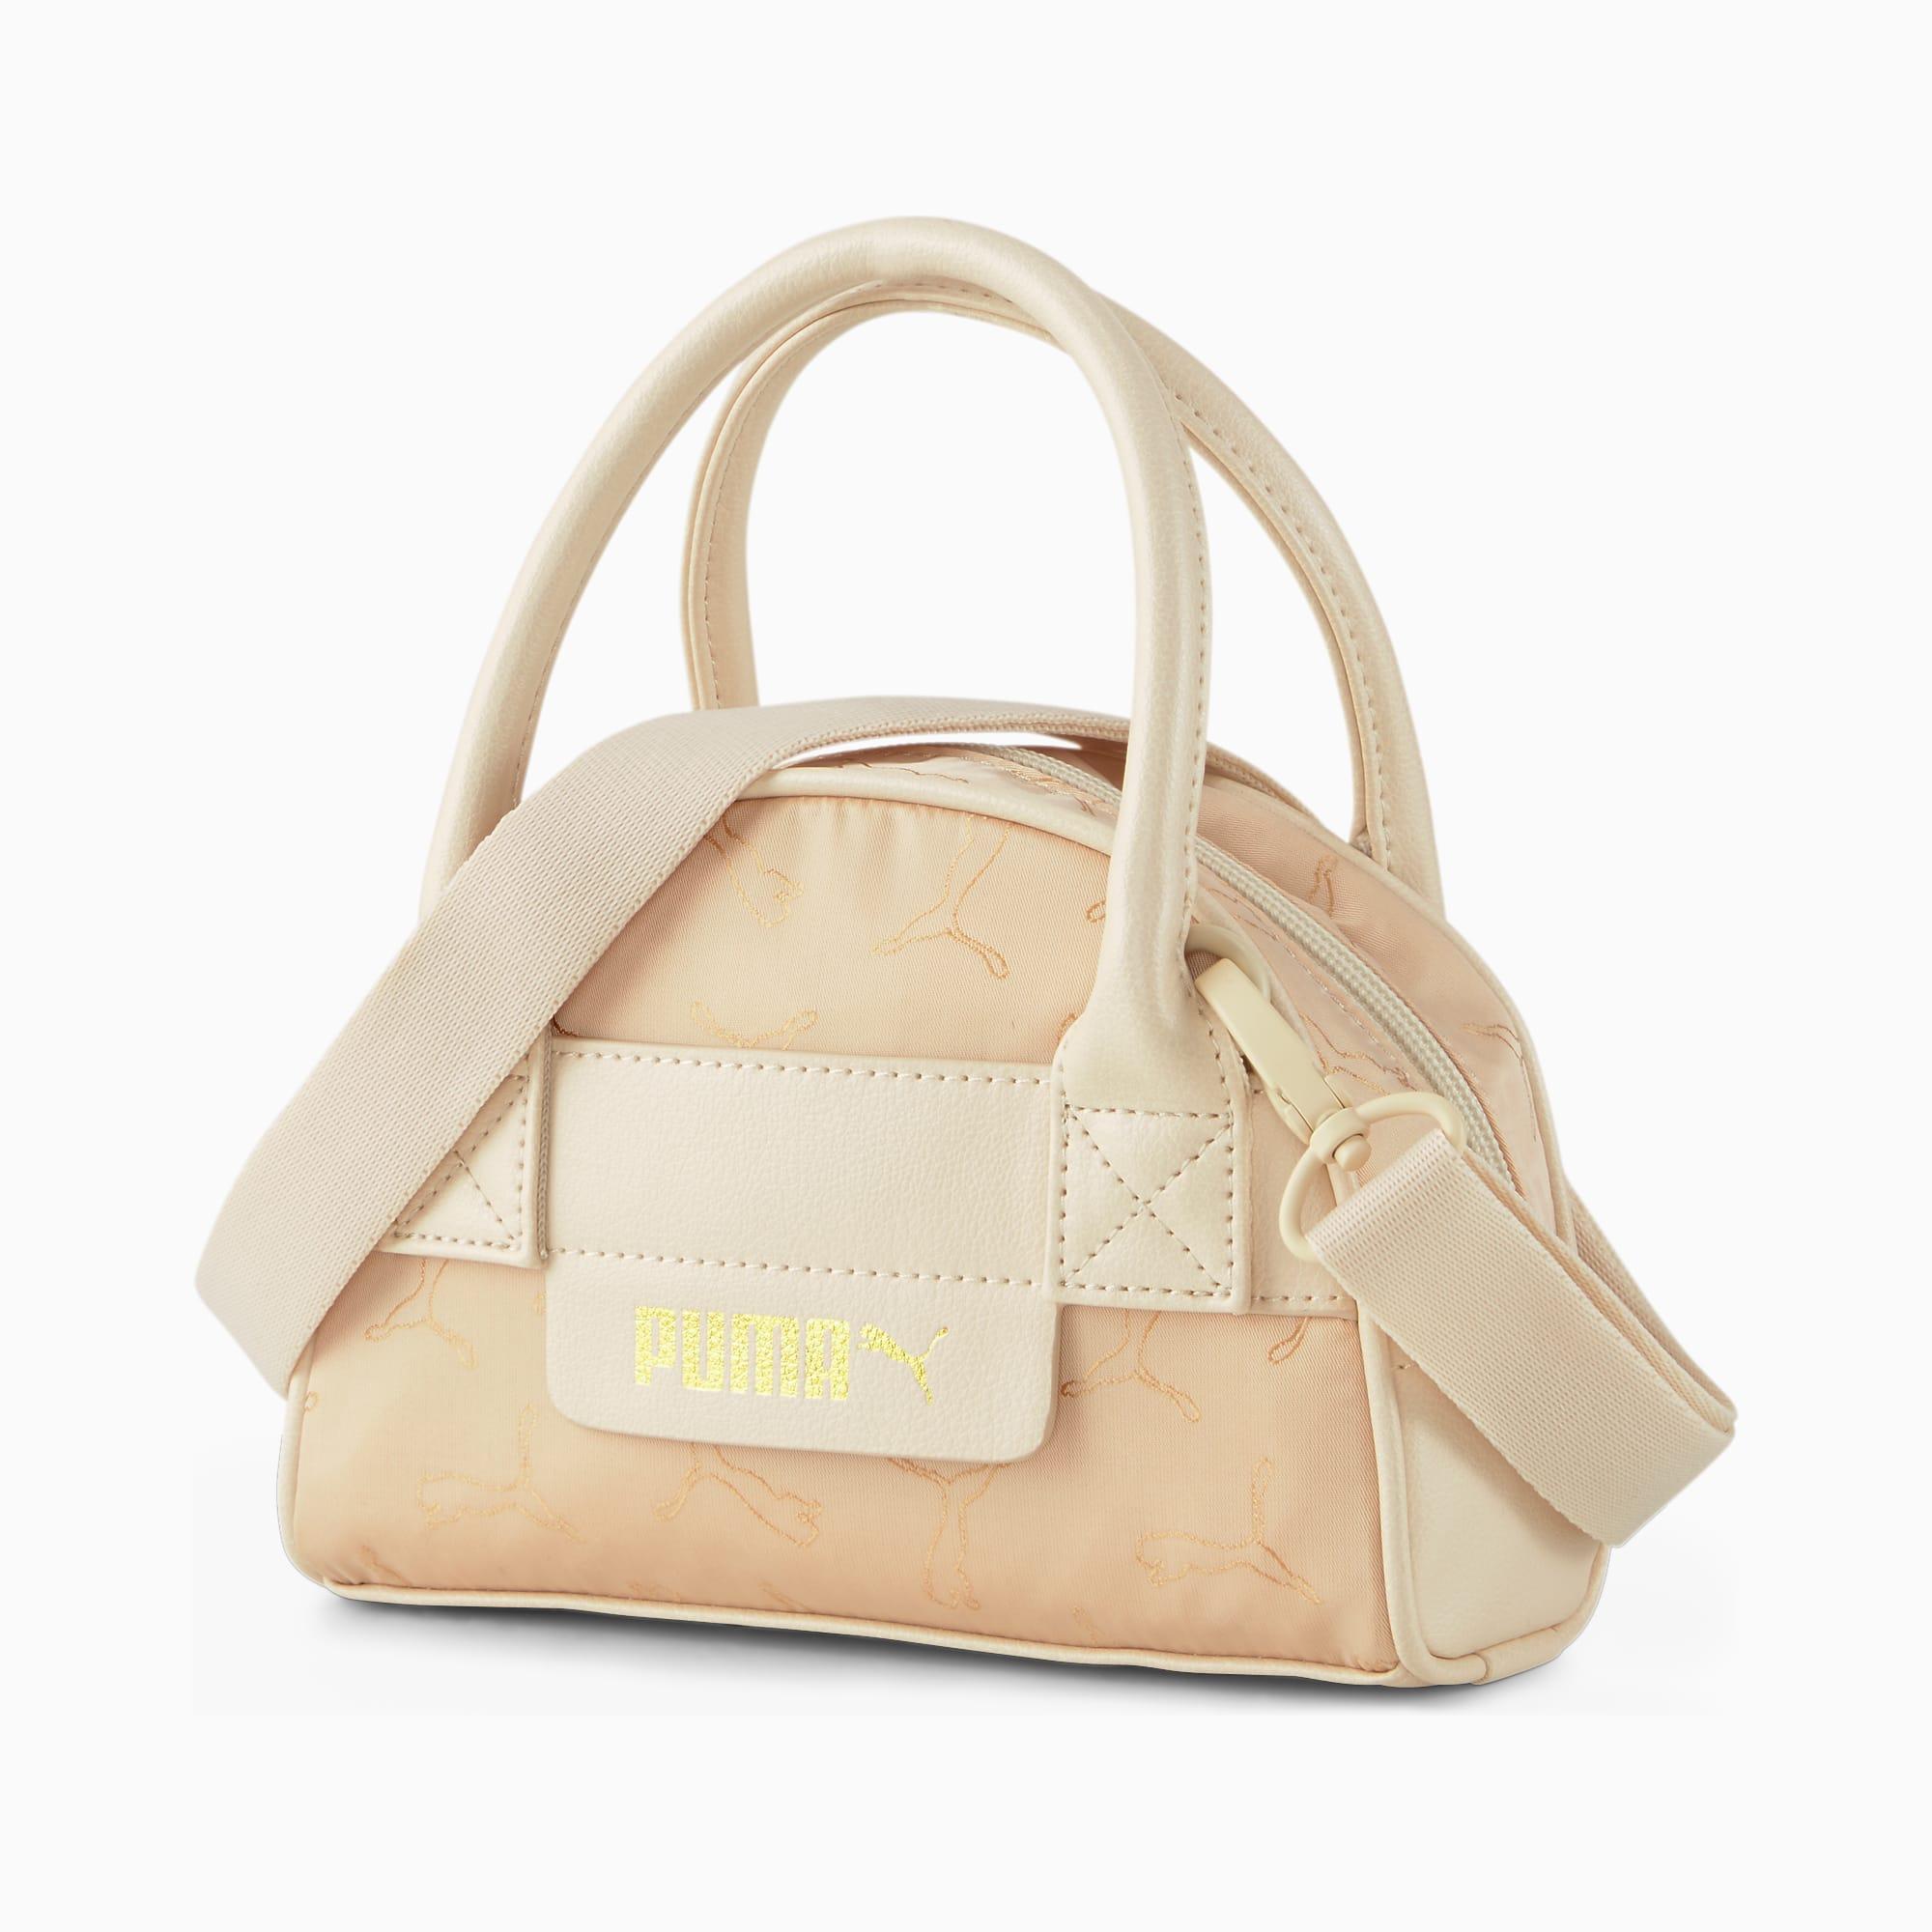 sac à main classics mini femme, accessoires